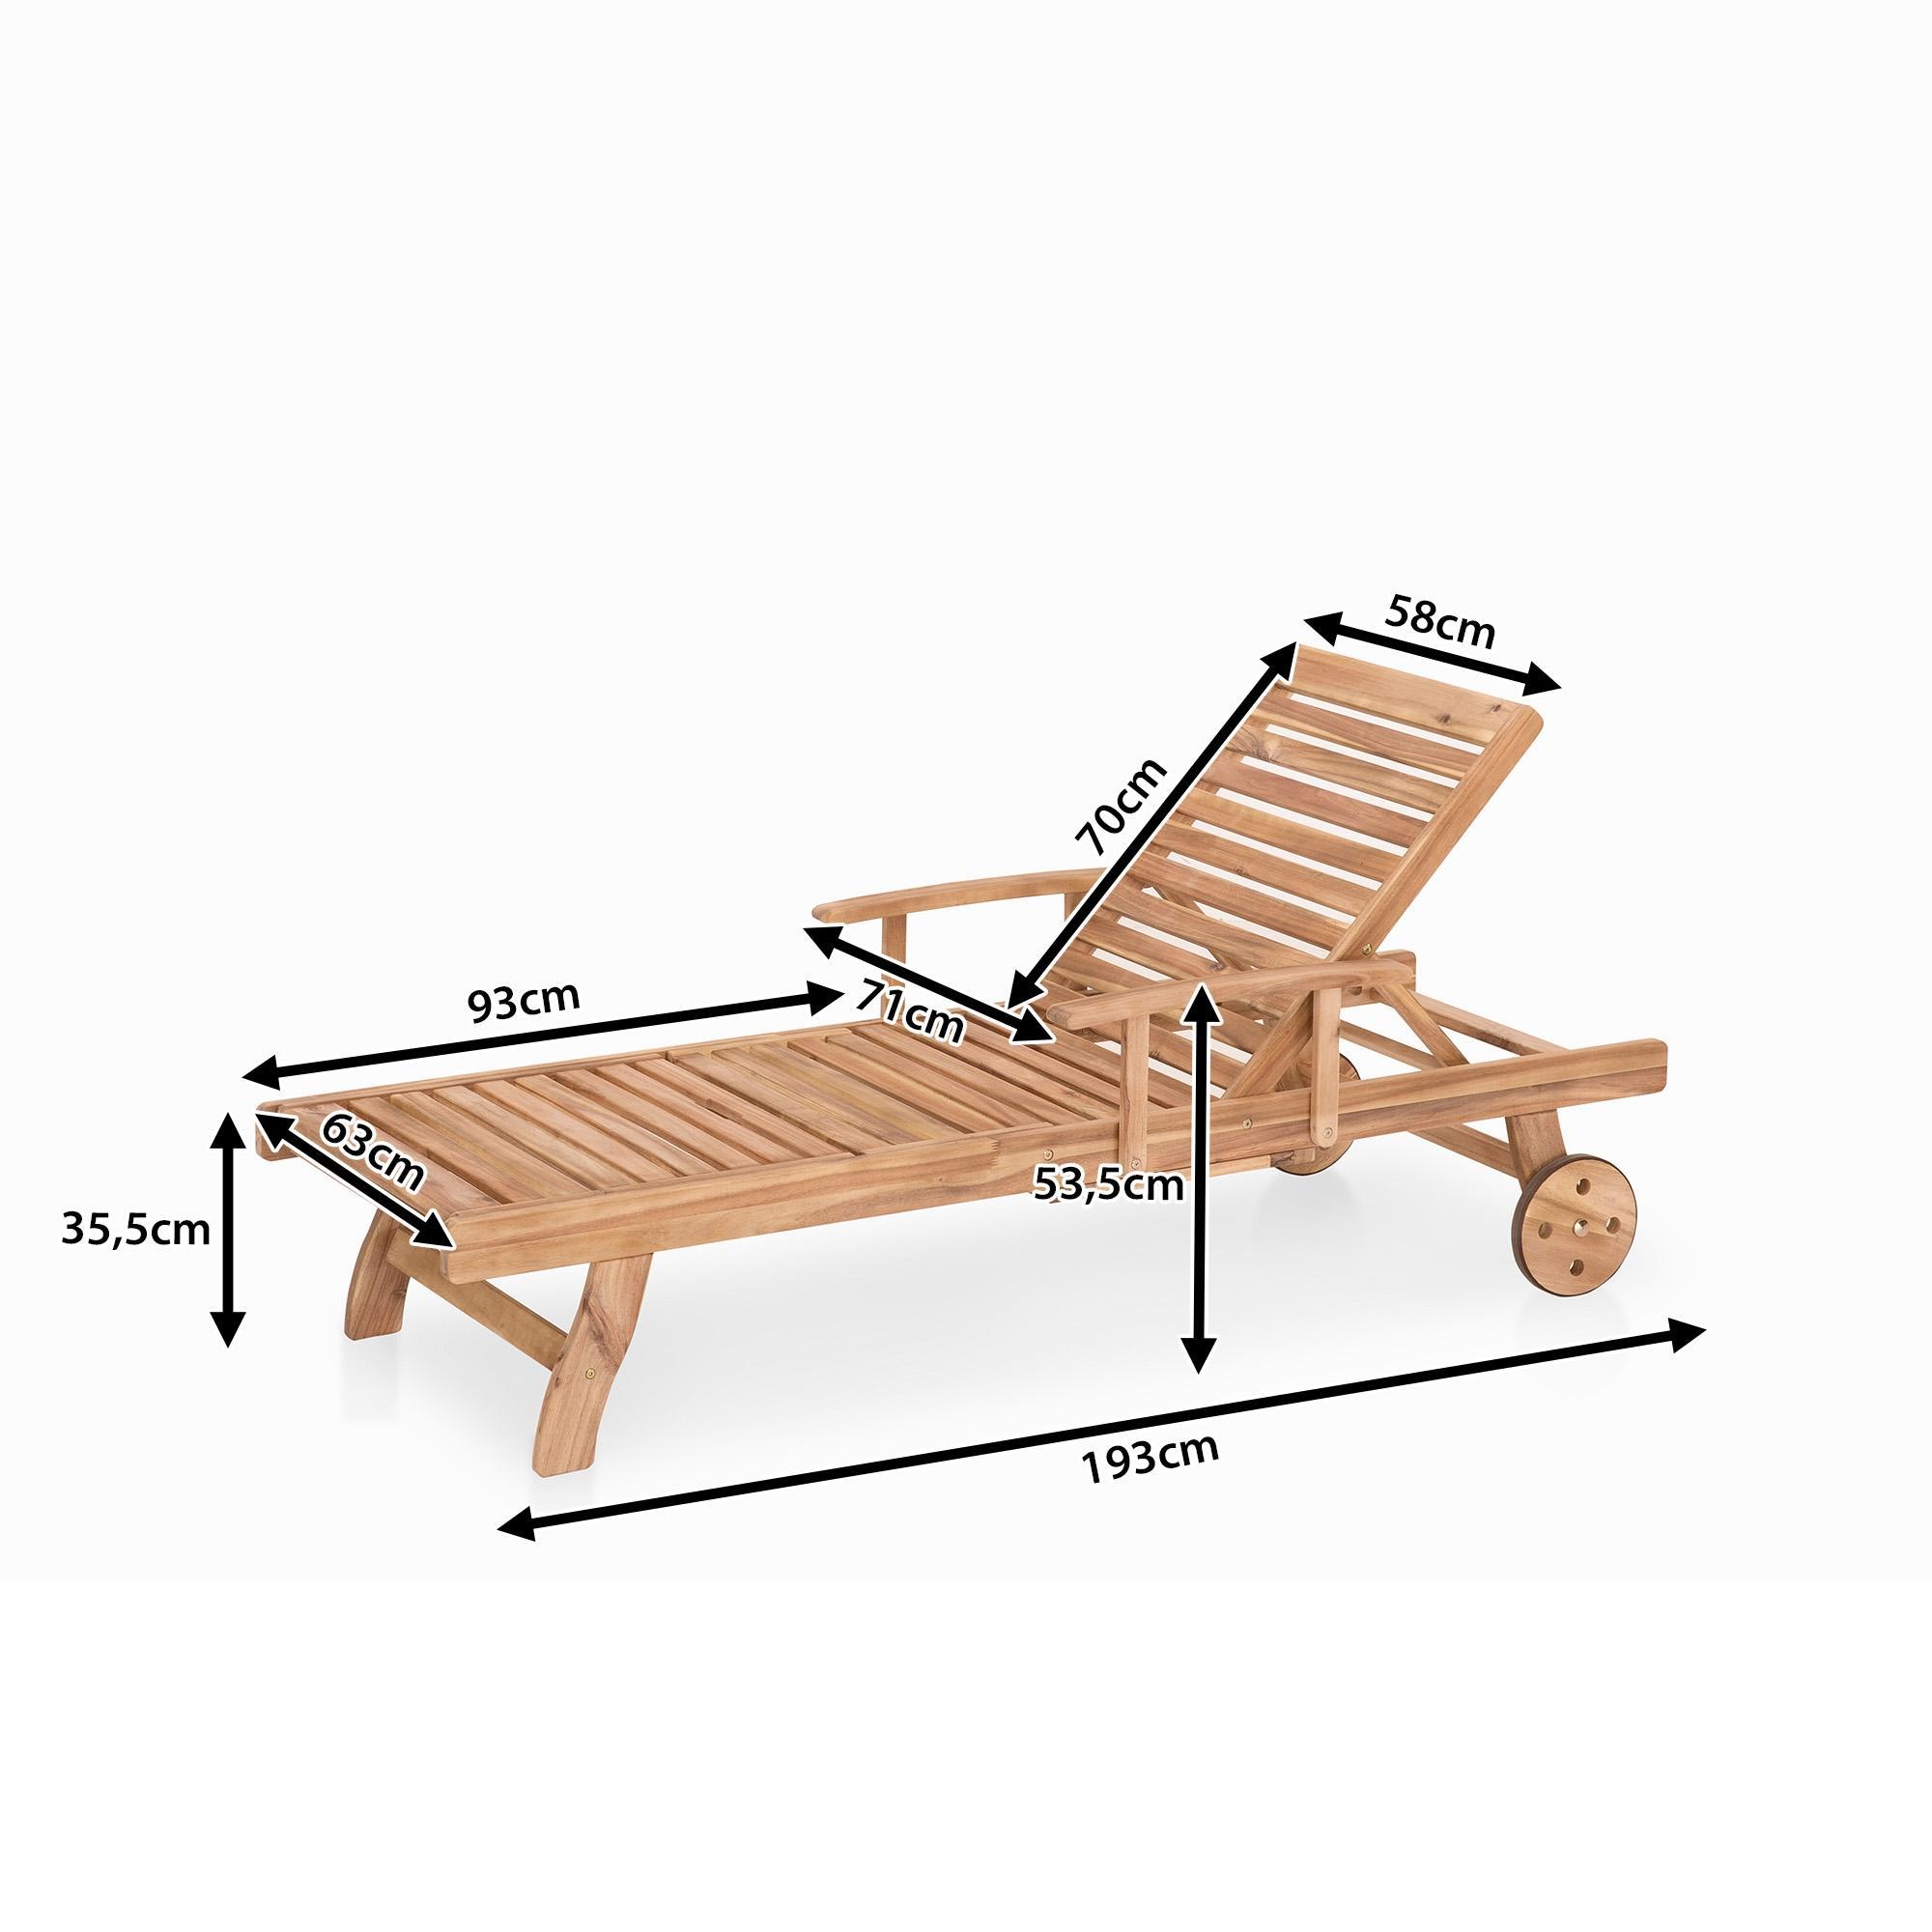 Meubles en bois teck chaise longue de jardin beliani - Chaise de jardin en bois ...